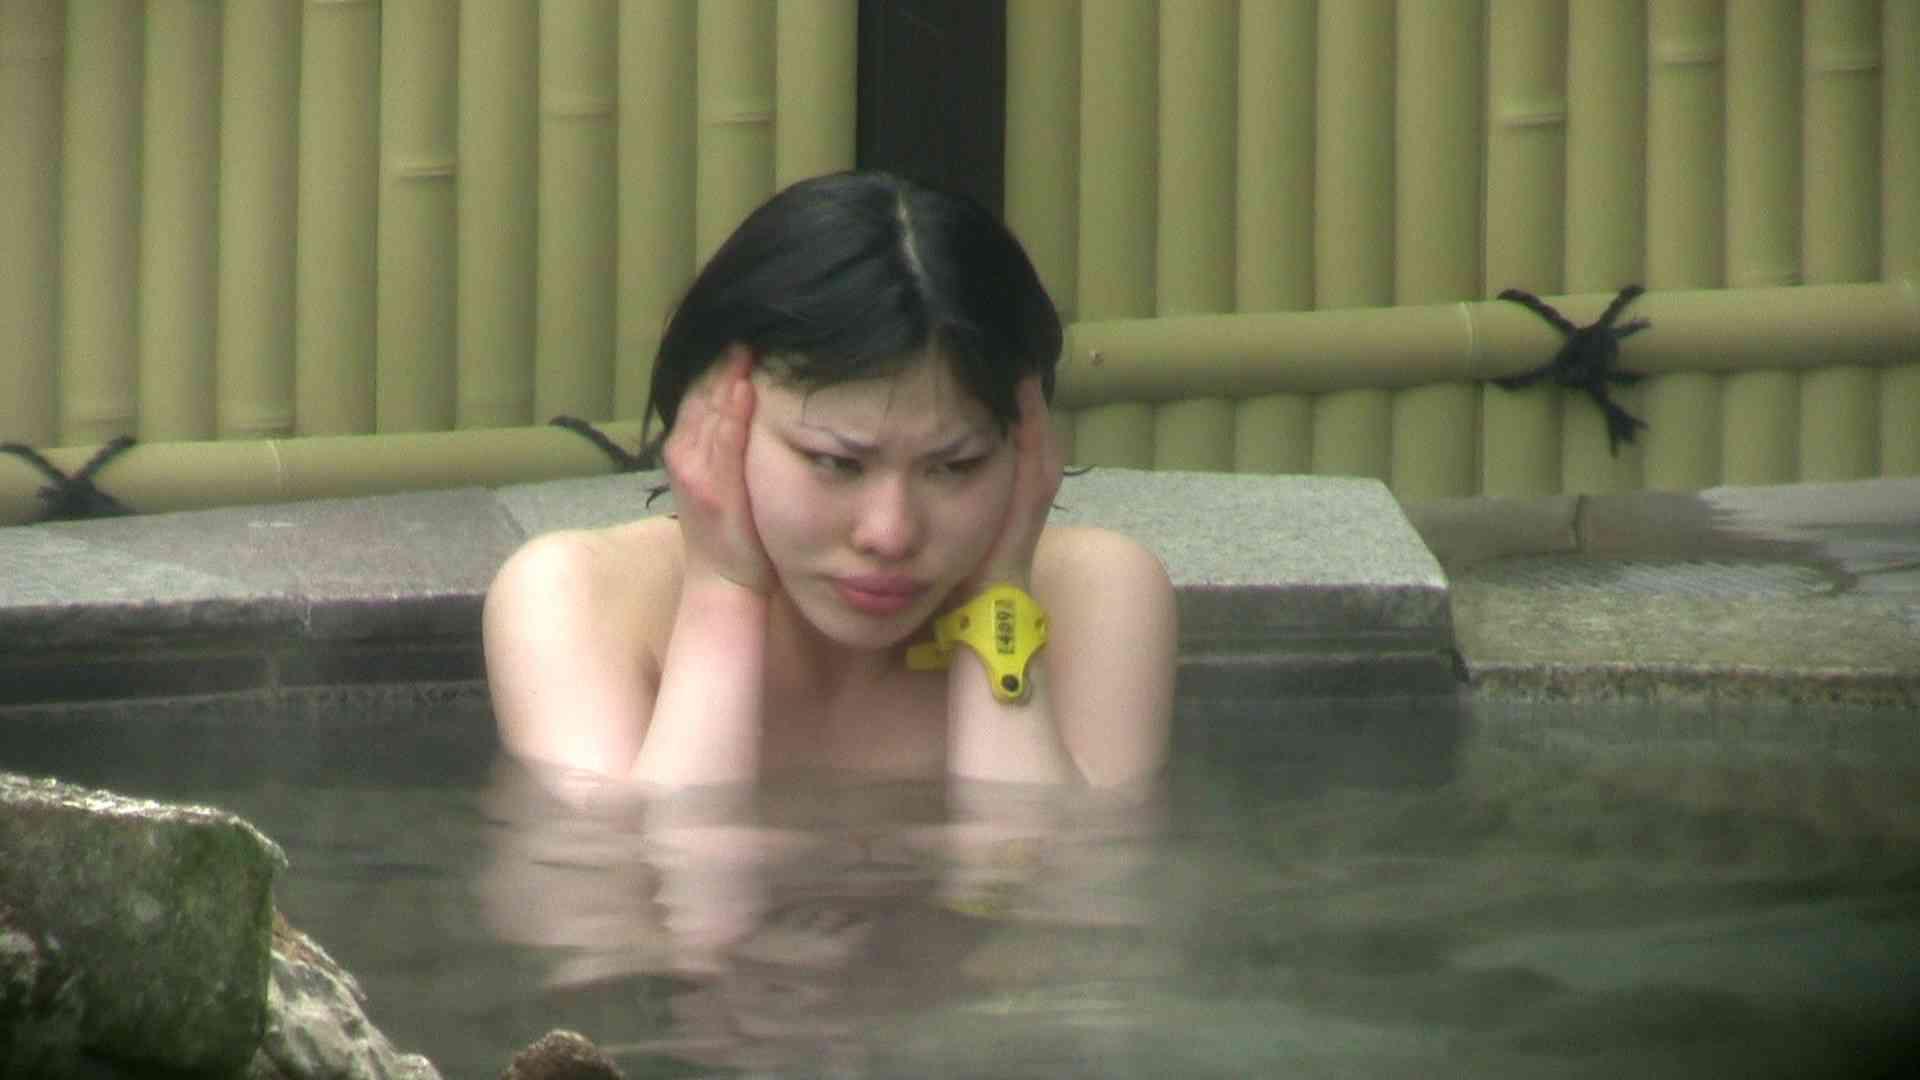 Aquaな露天風呂Vol.114 盗撮映像  72Pix 38